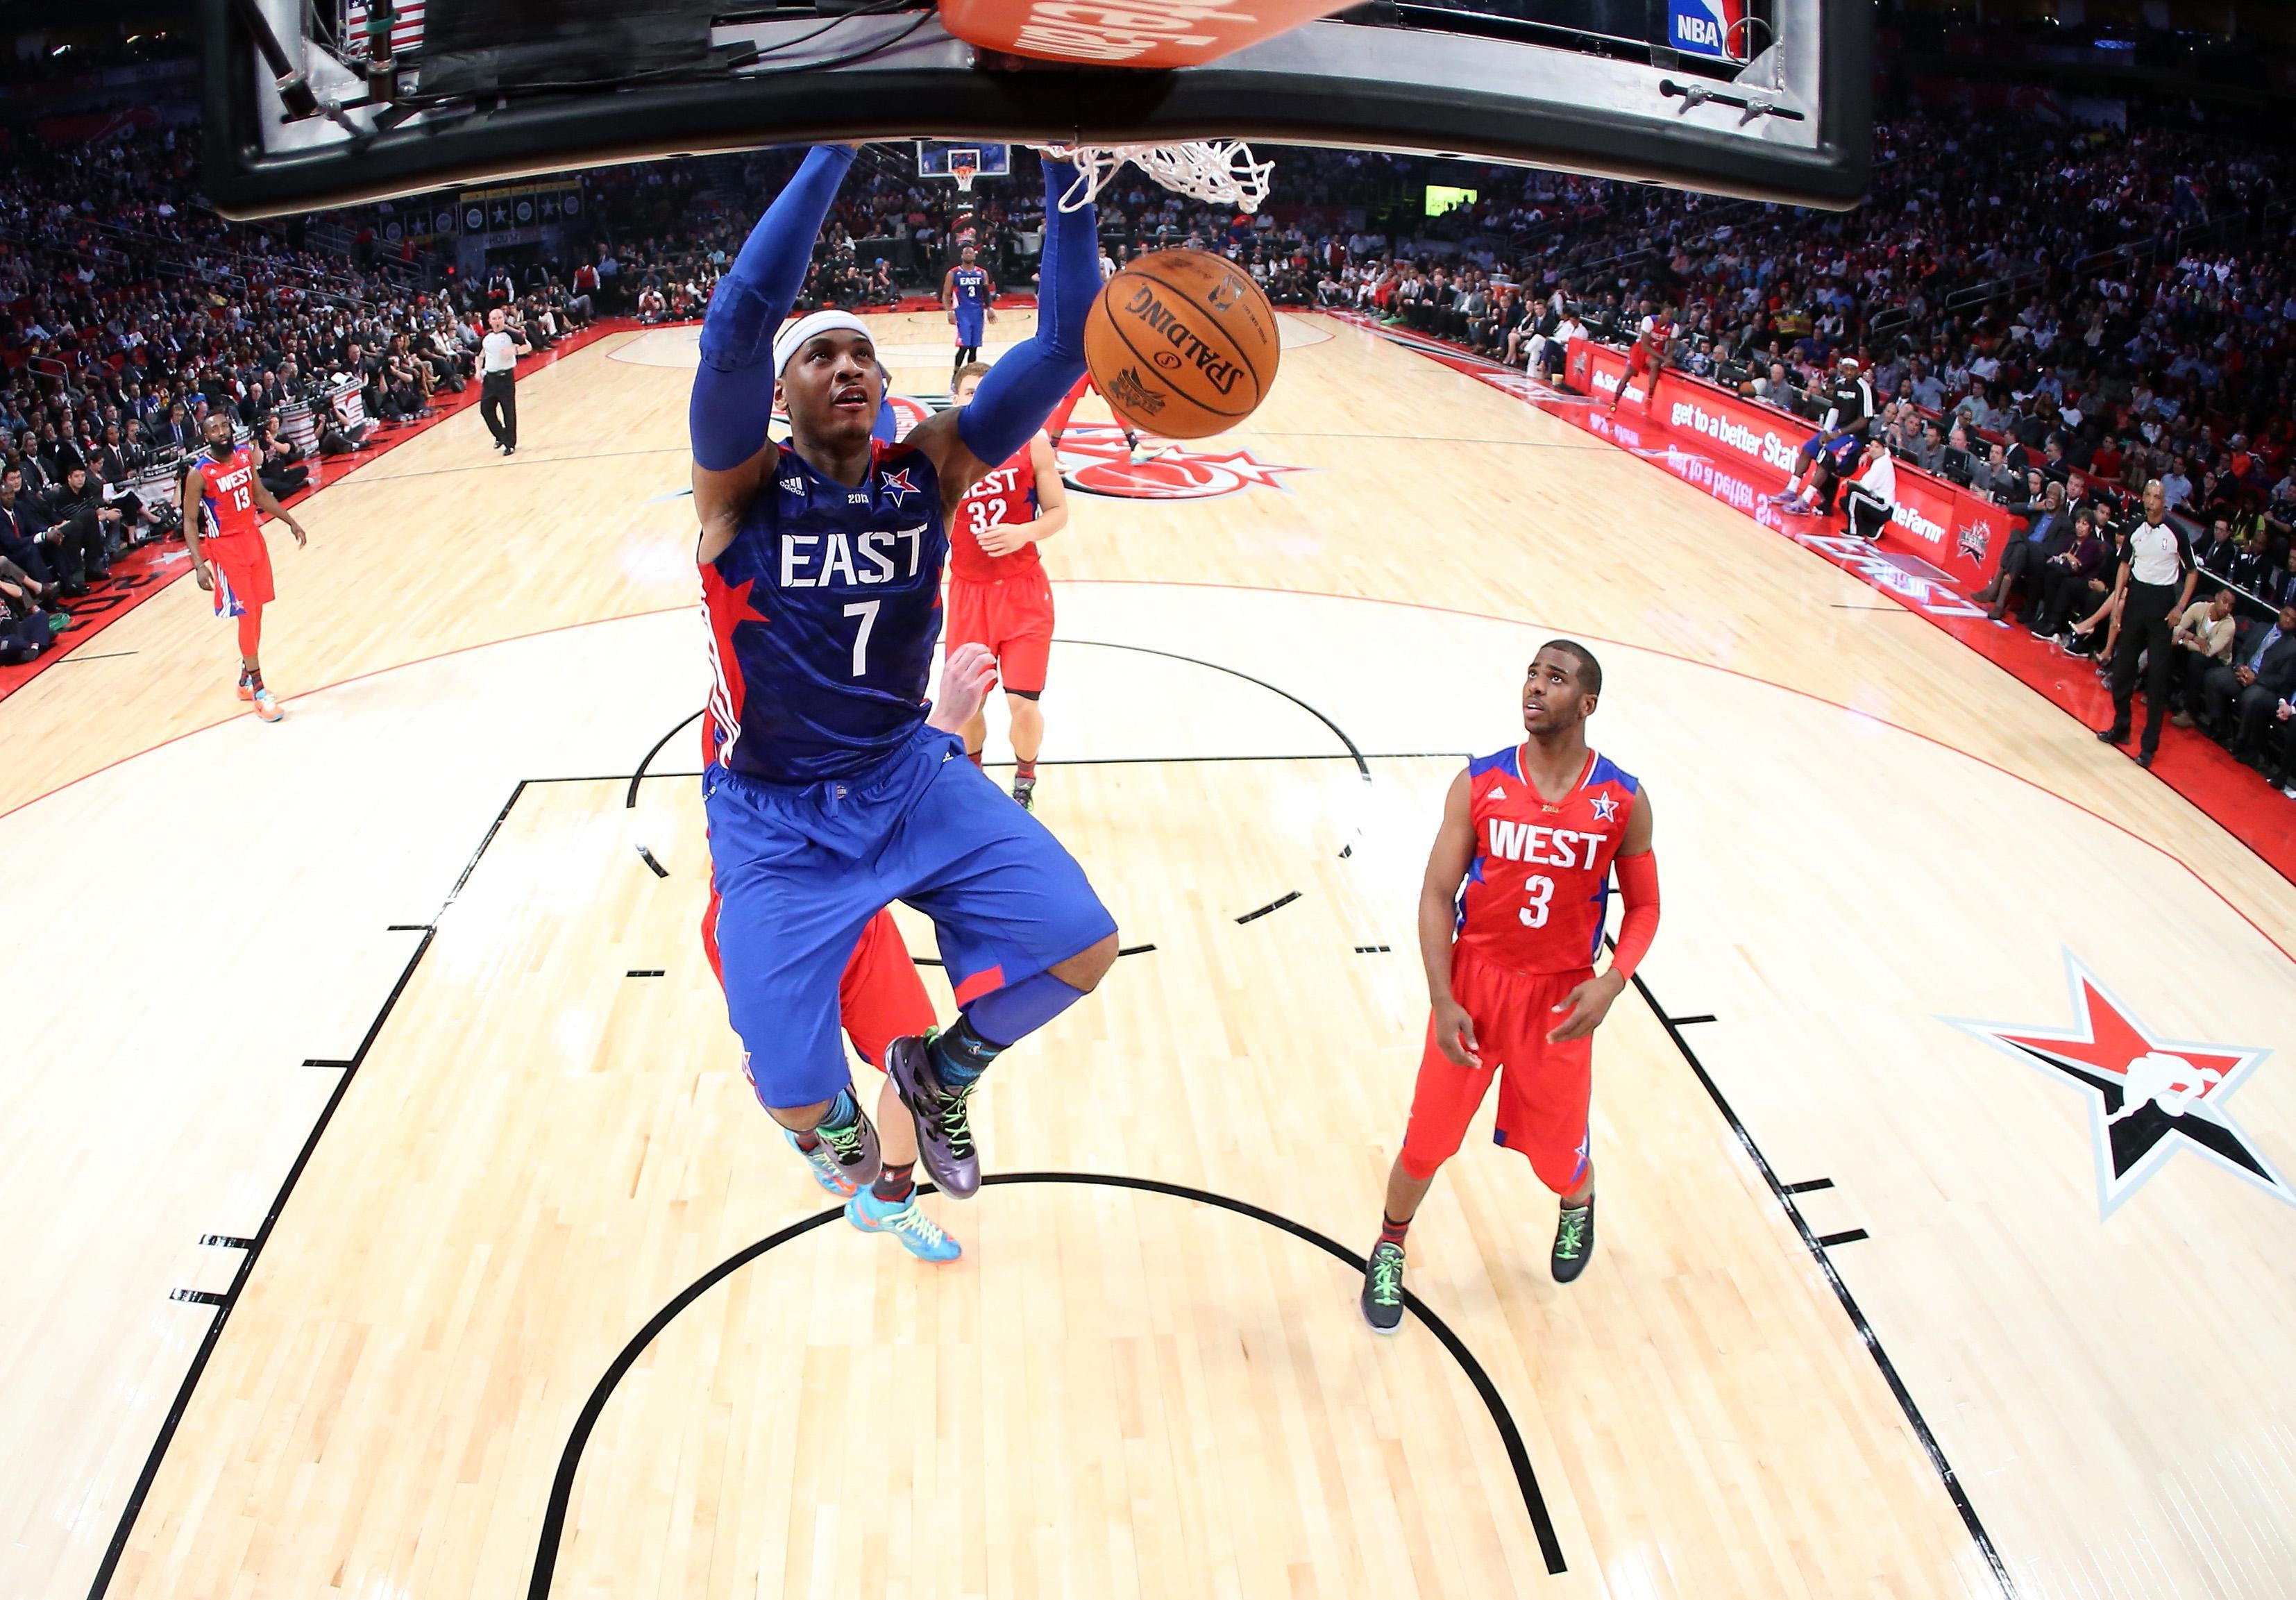 Carmelo Anthony, No. 7 of the New York Knicks